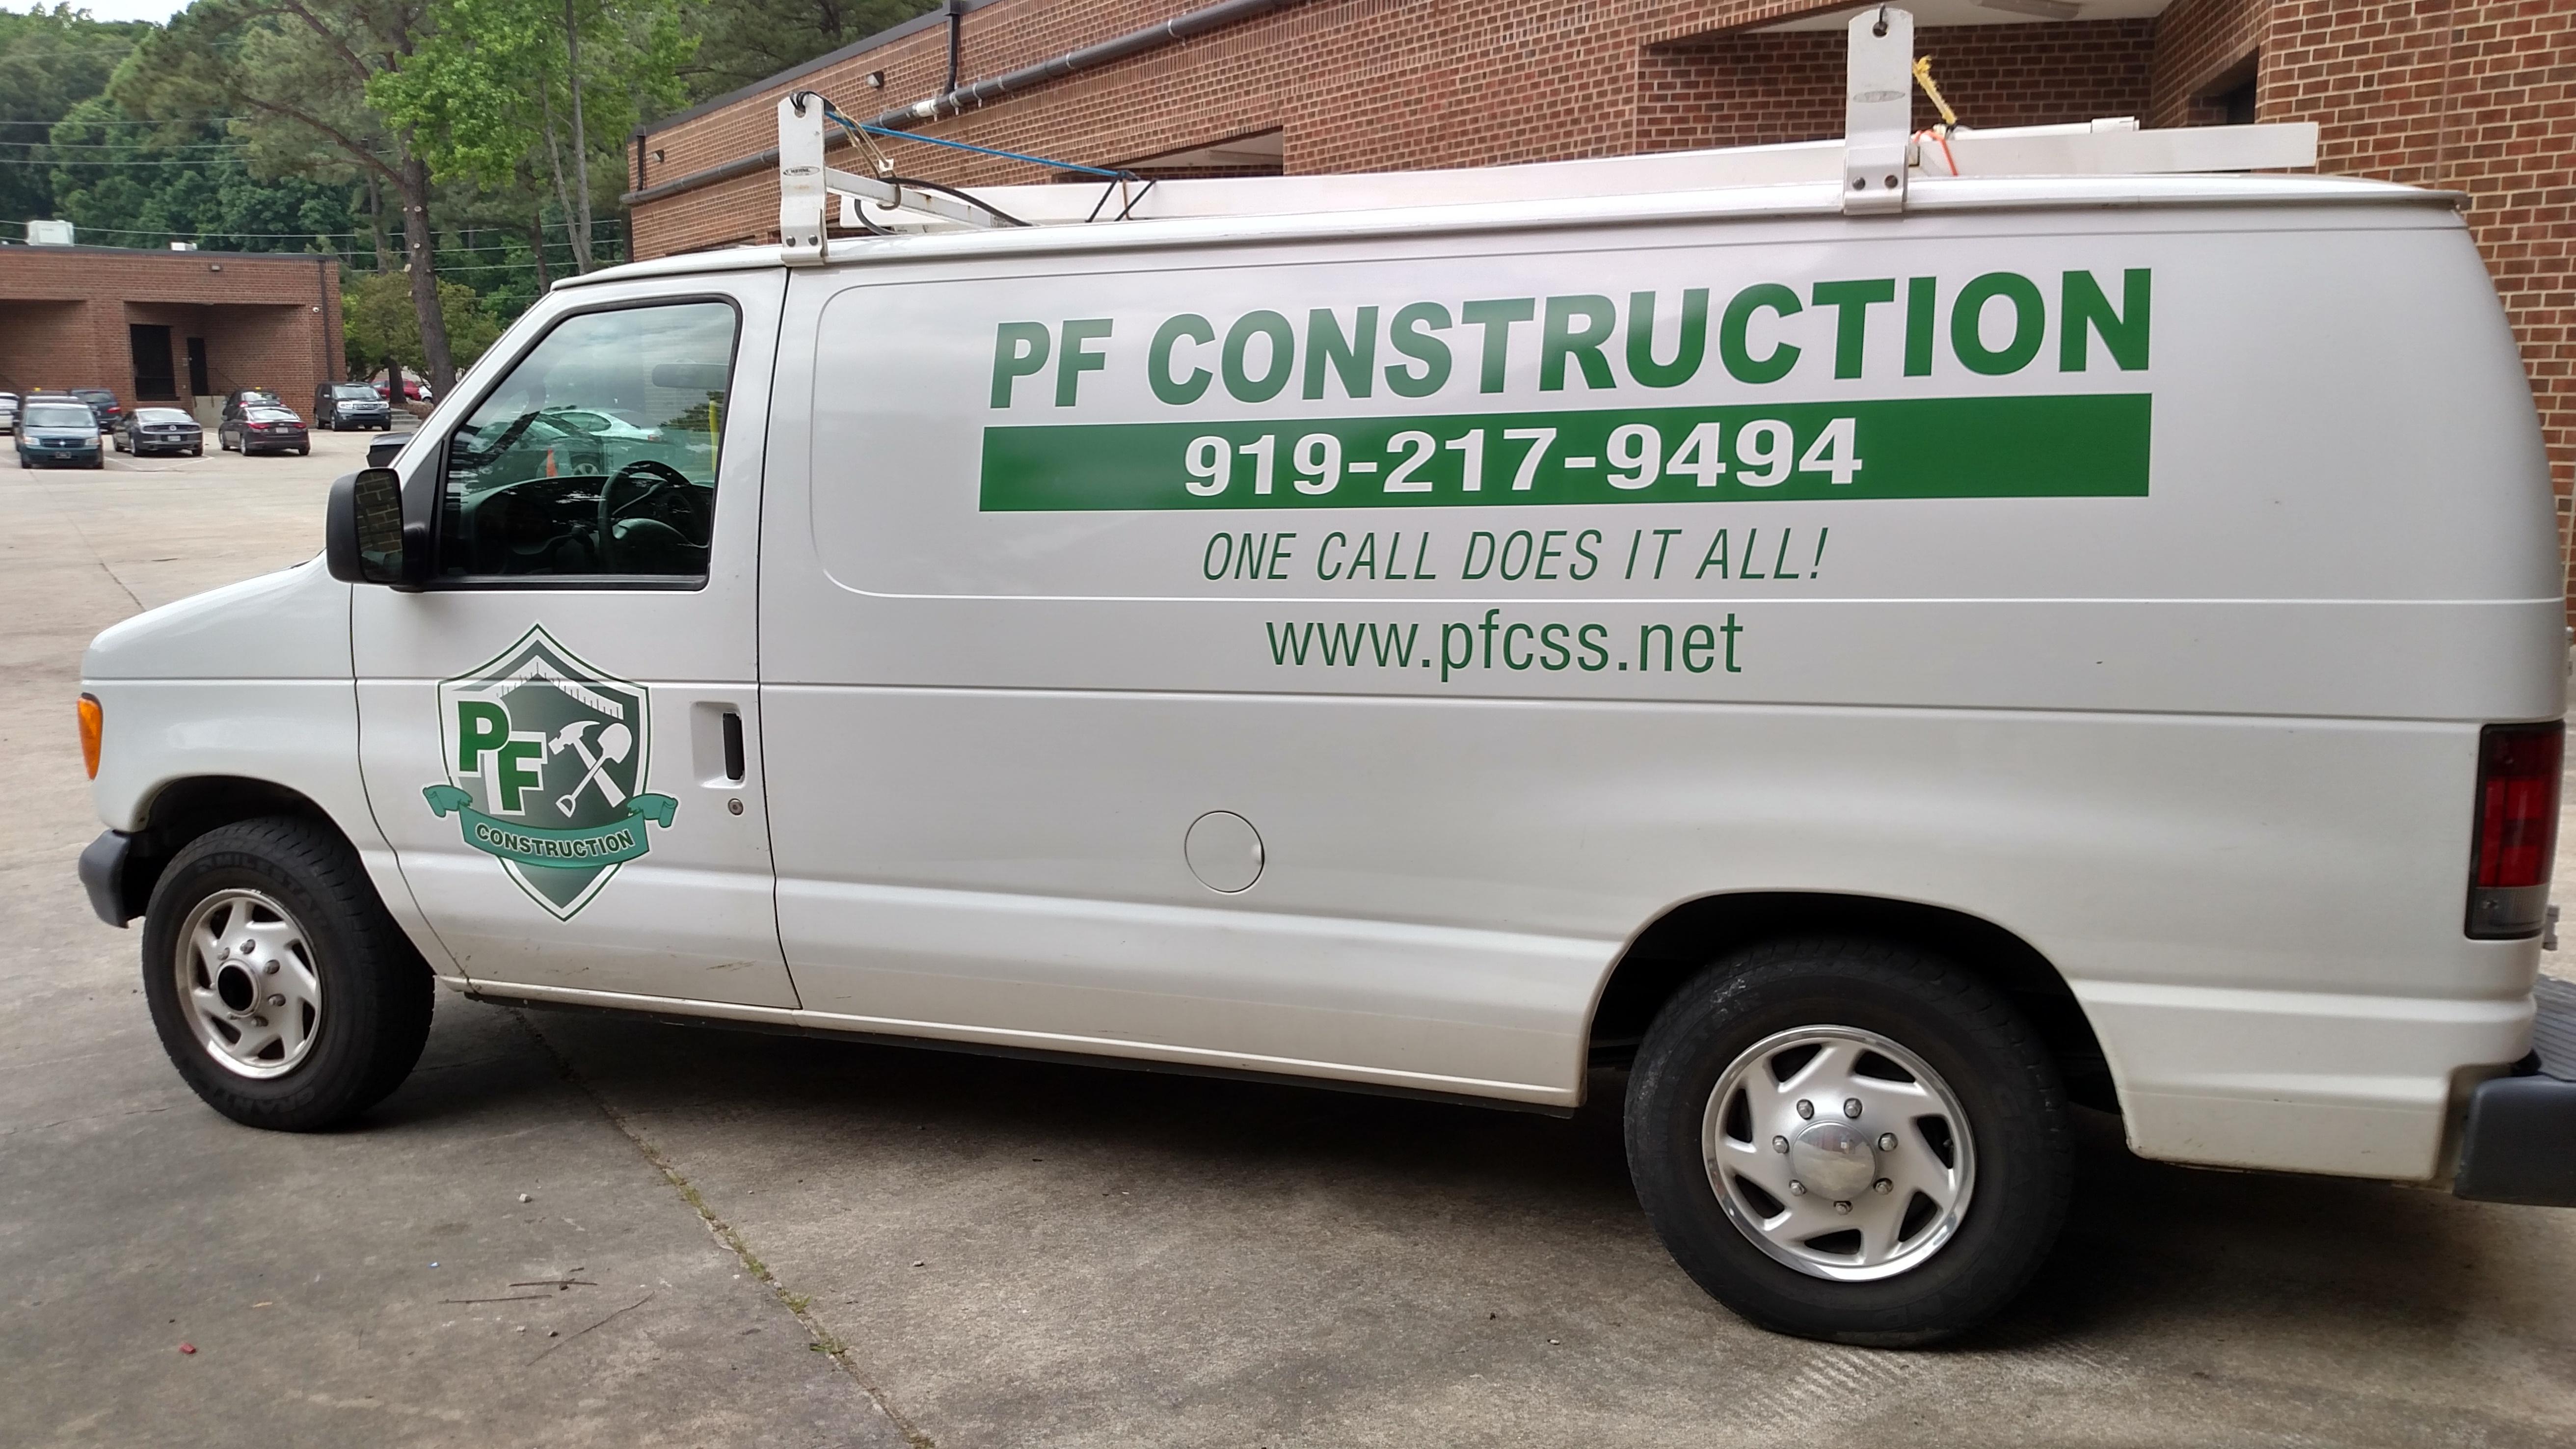 Pf Construction Van Signergy